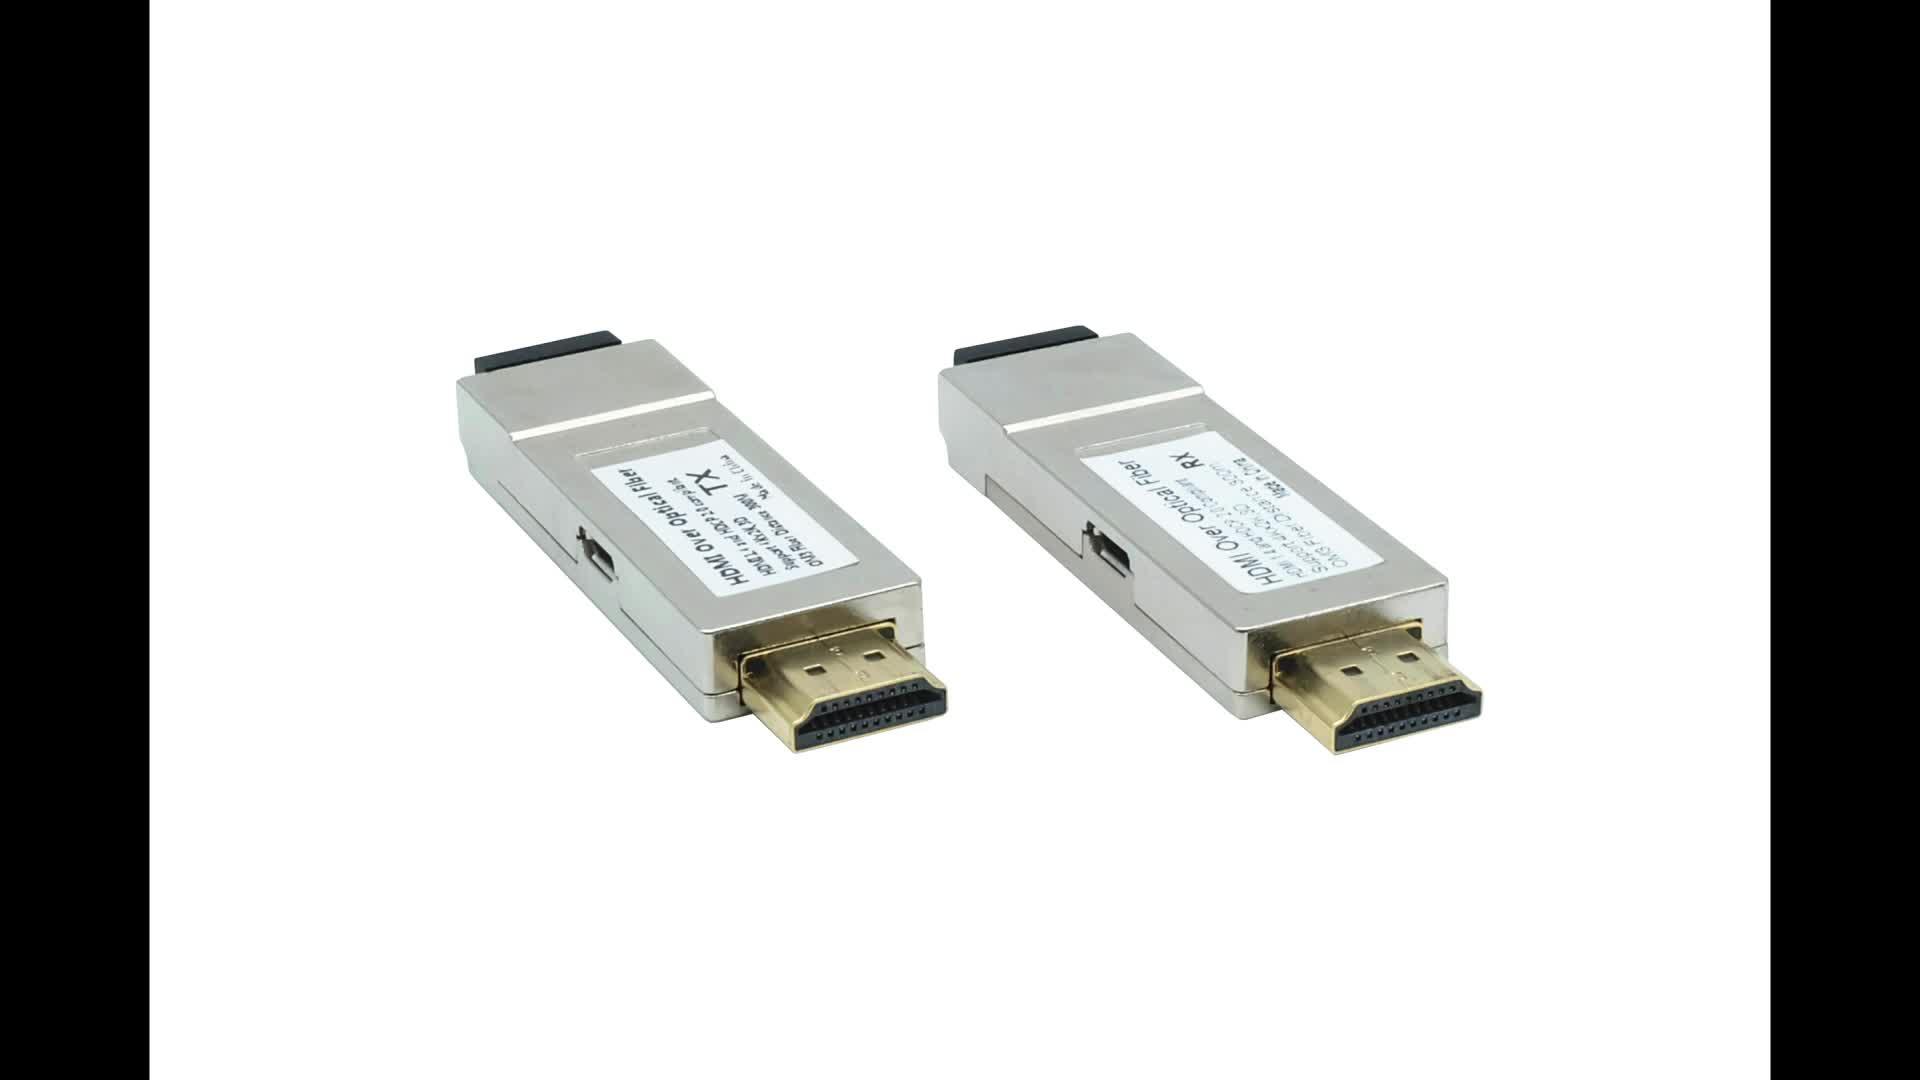 PWAY/High quality mini HDMI fiber extender 300m